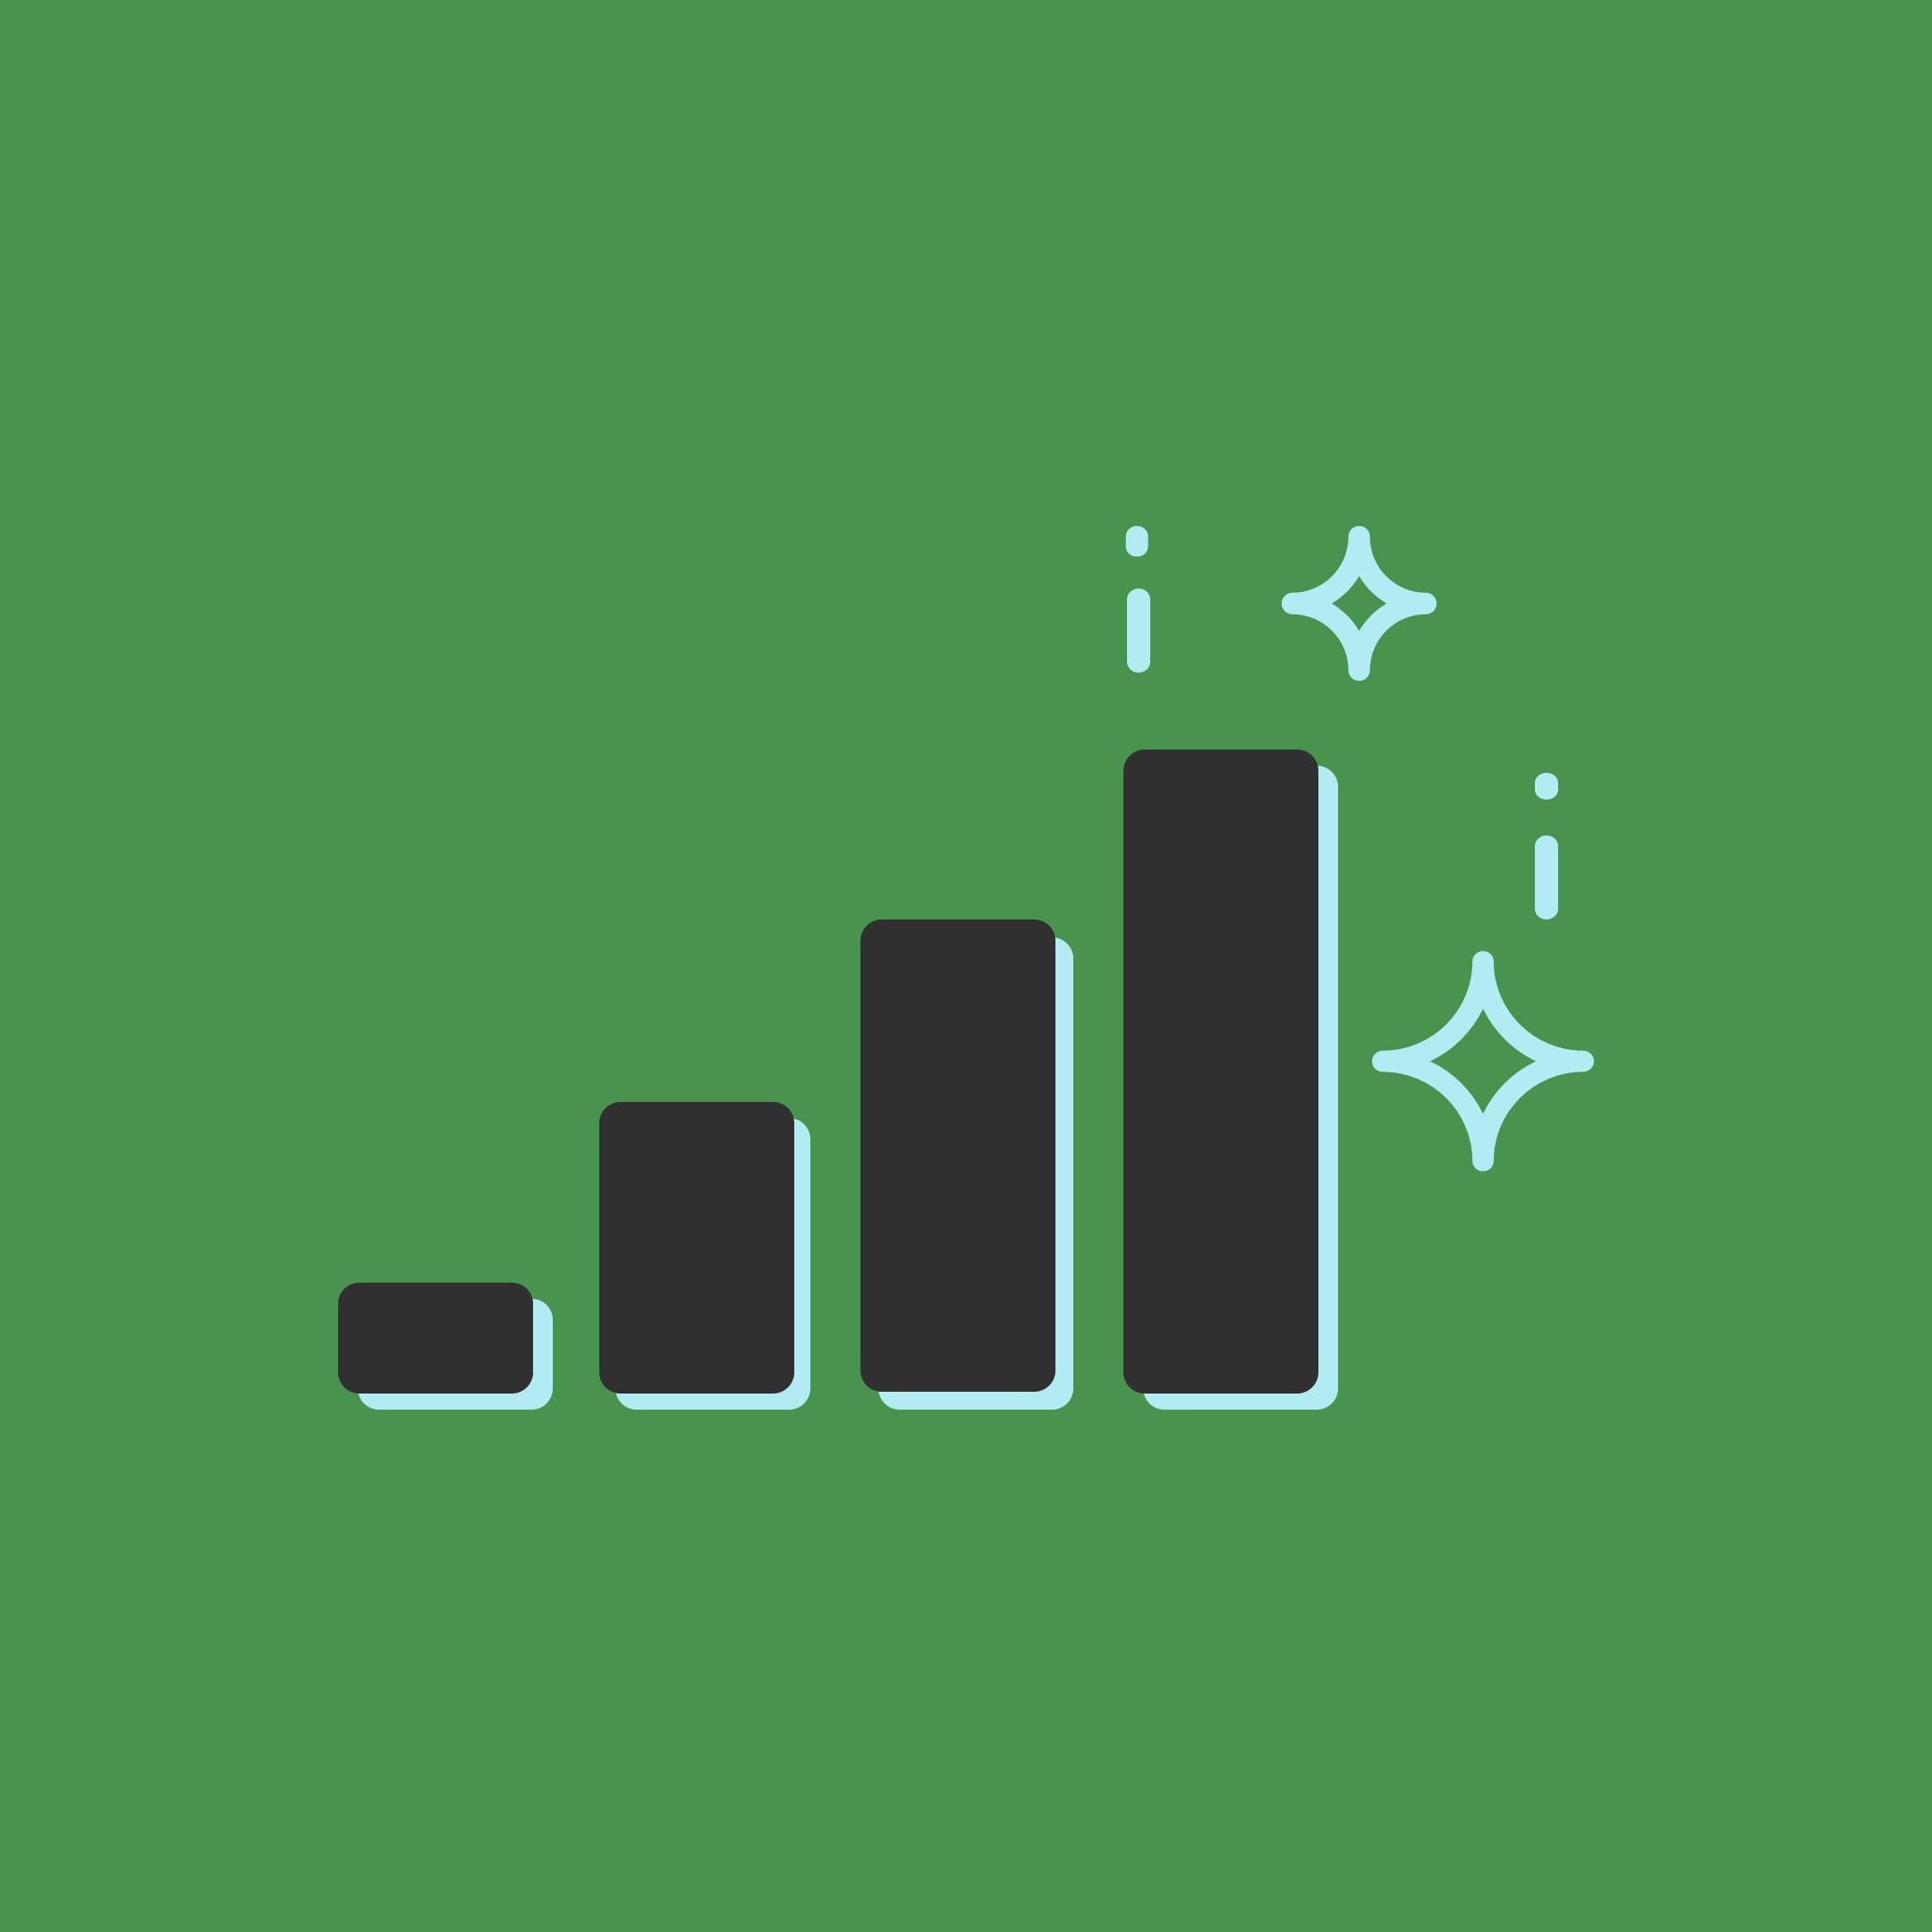 Client profitability for creative agencies